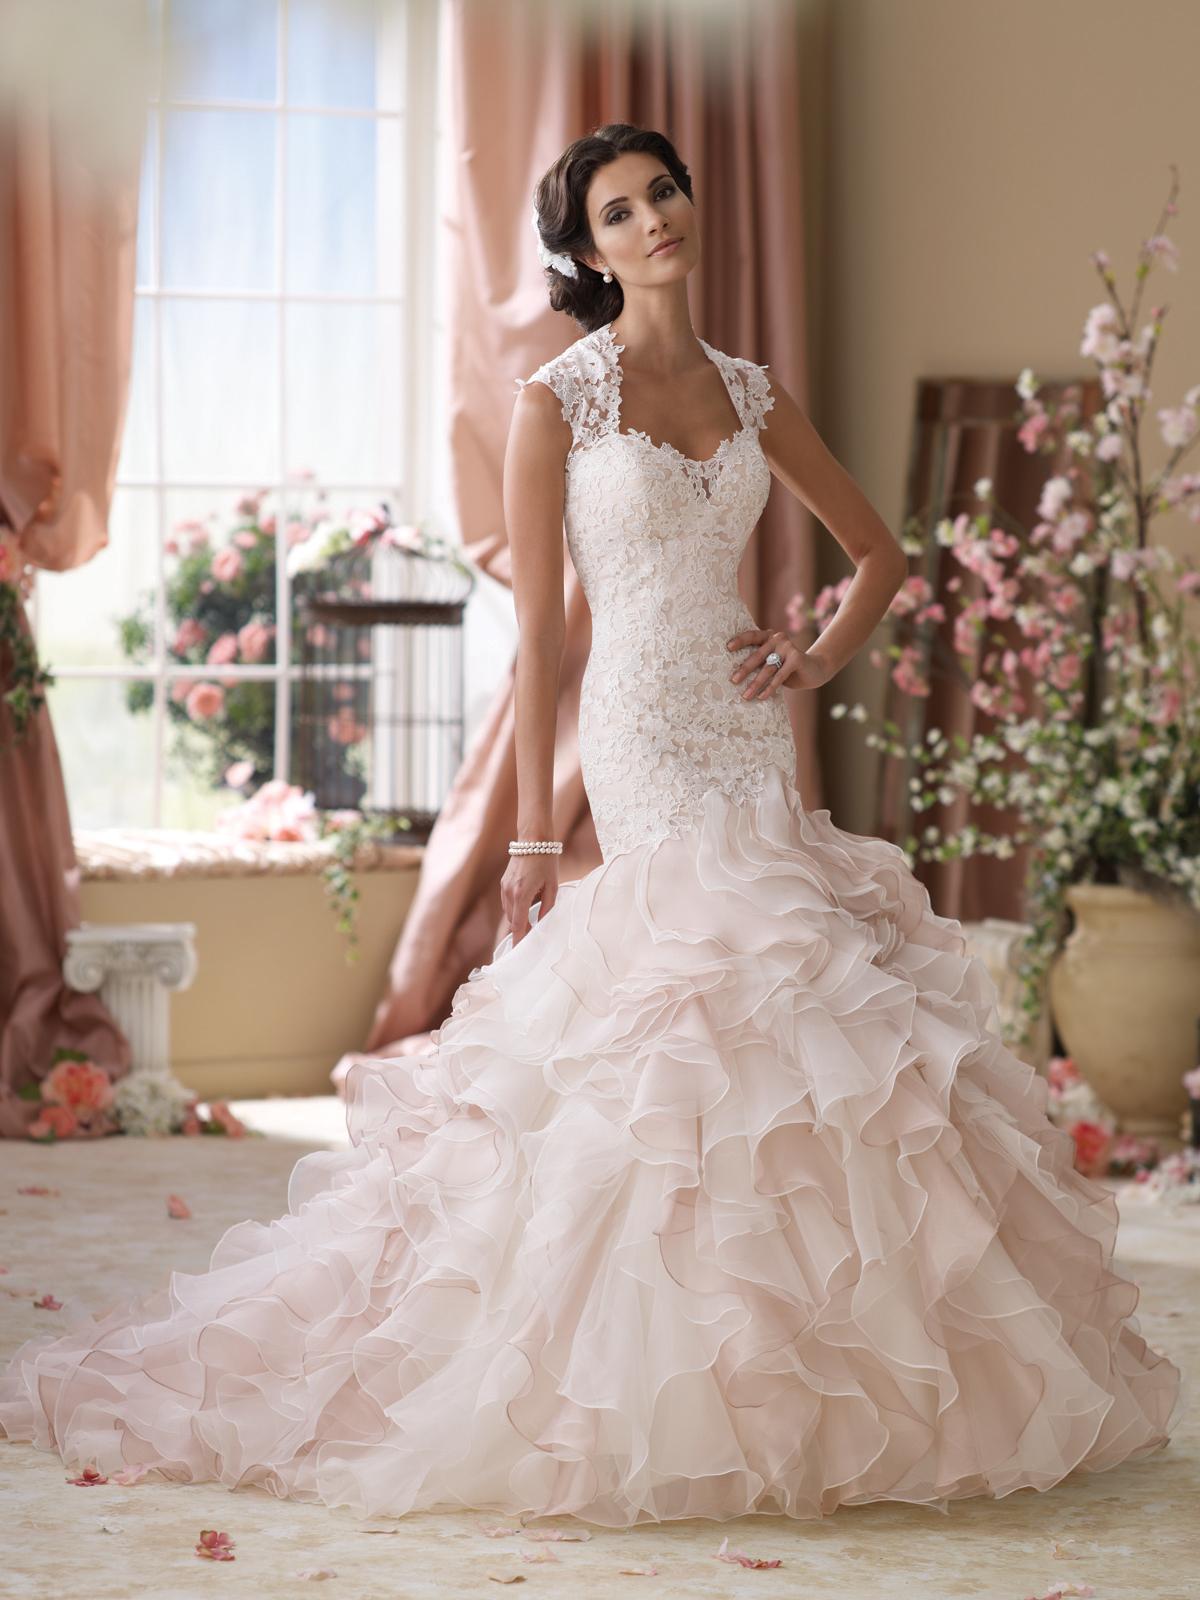 36 Most Stunning Wedding Dresses